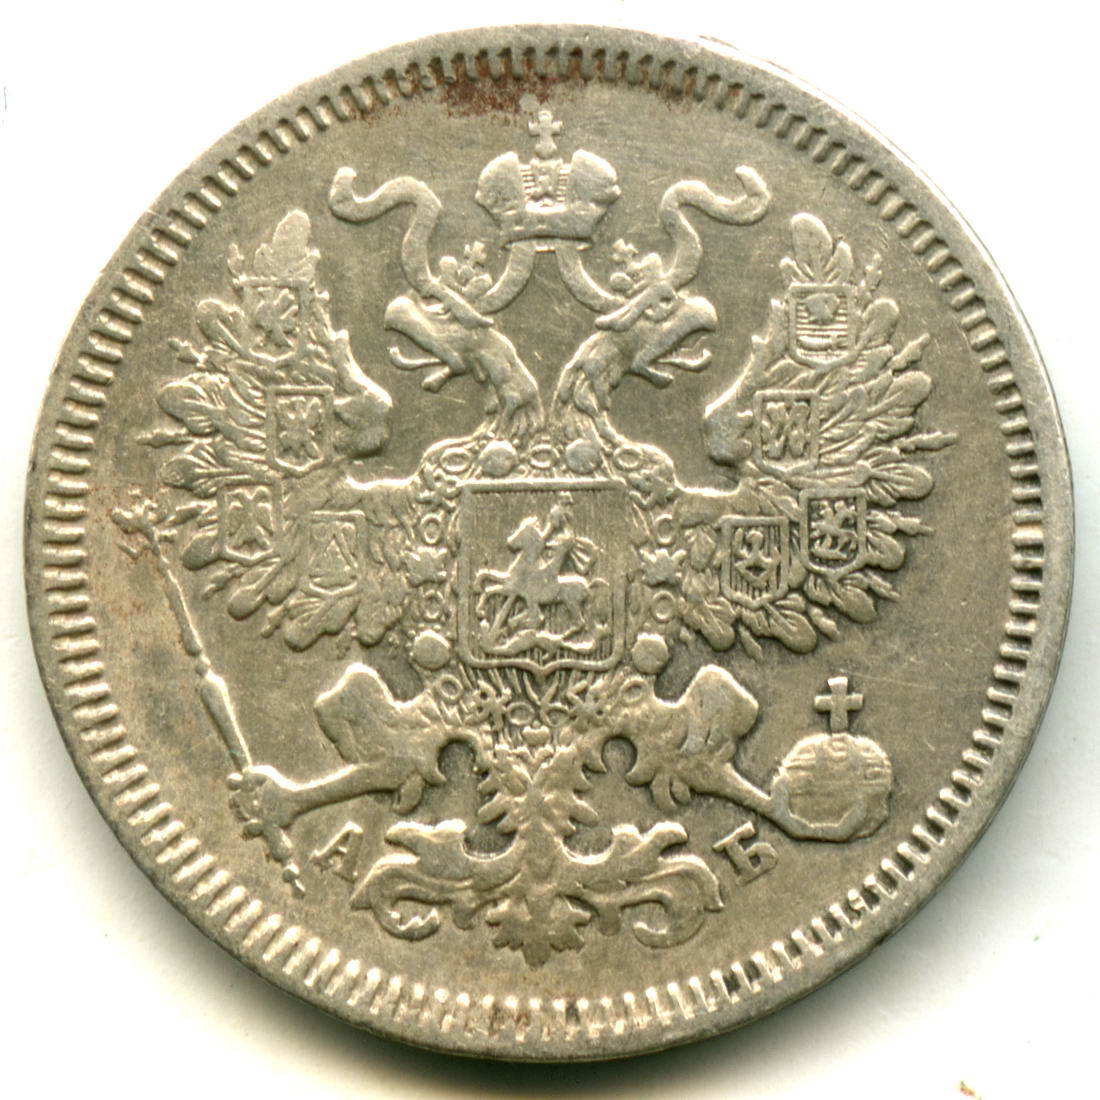 20 копеек 1863 г. СПБ АБ. Александр II. XF-